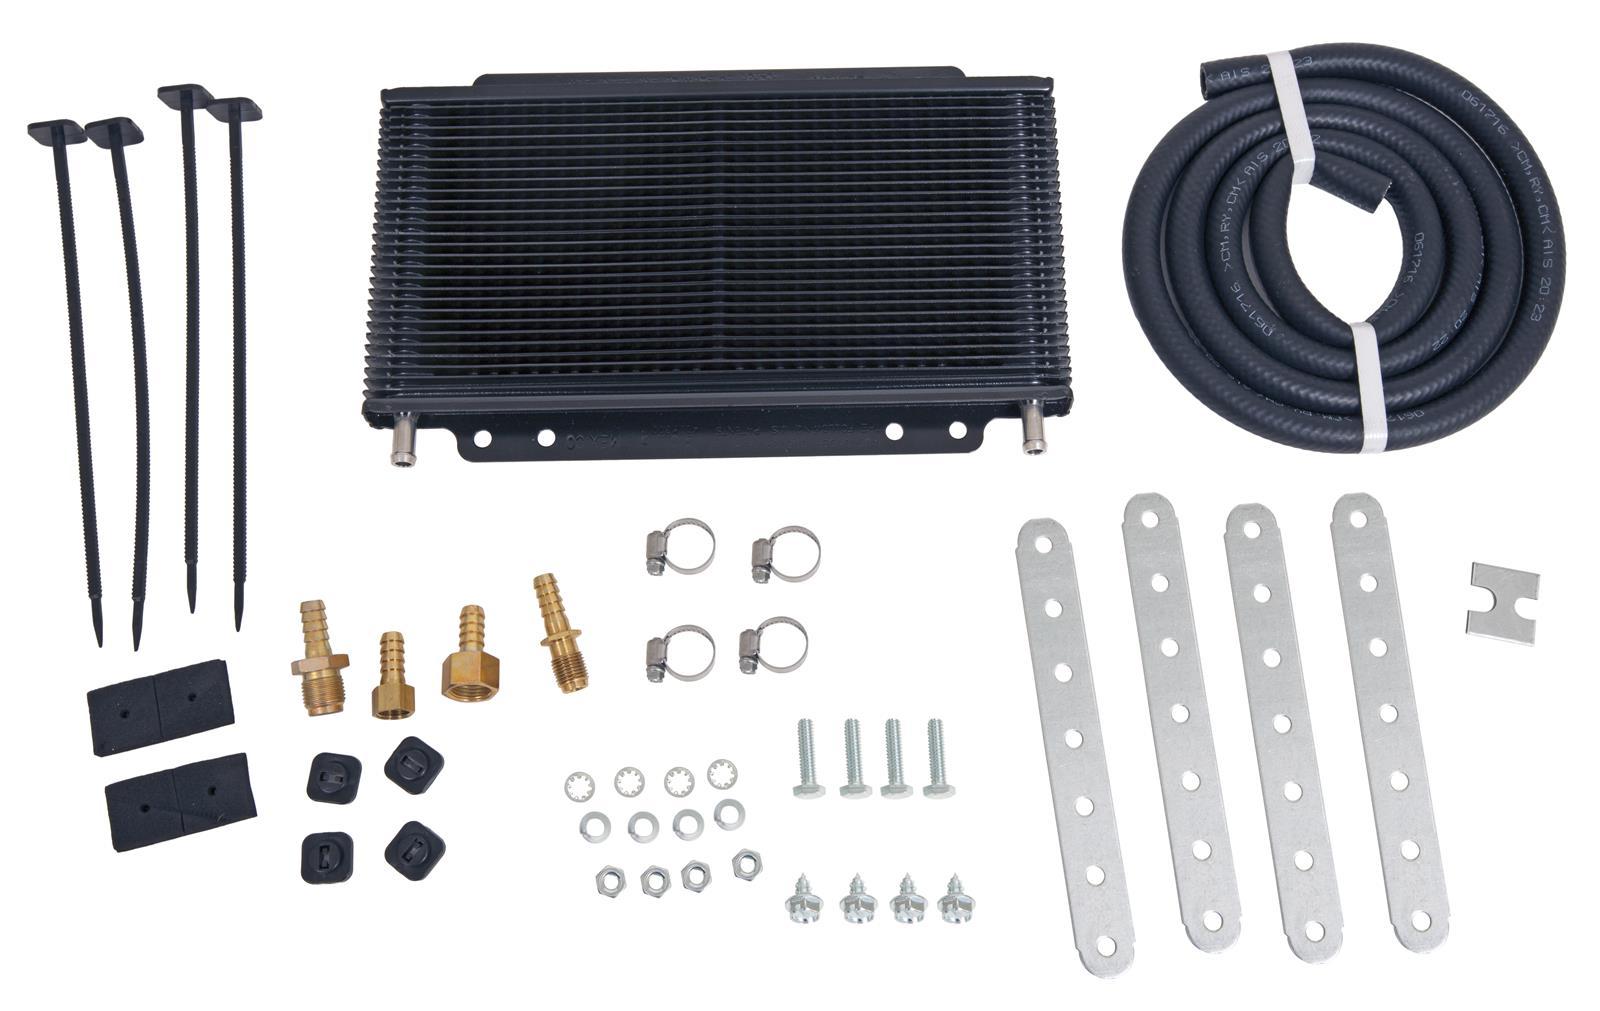 "B & M Supercooler Transmission Cooler Supercooler; 11"" x 5-3/4"" x 3/4""; BTU Rating 9,800 [Universal]"